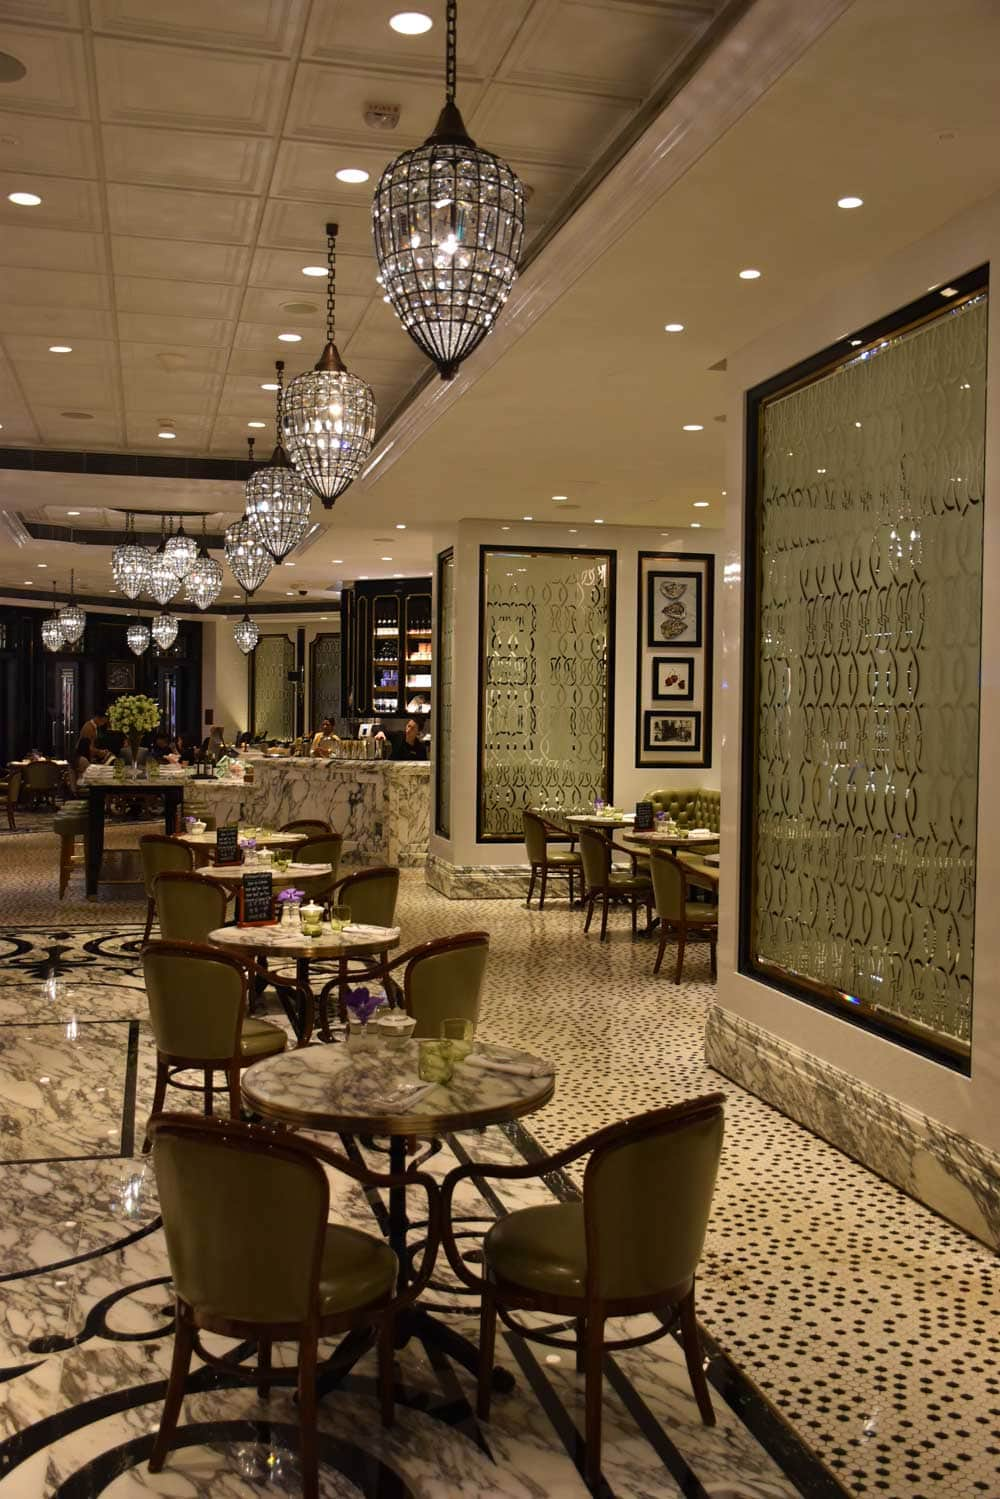 Ritz-Carlton Cafe Macau interior